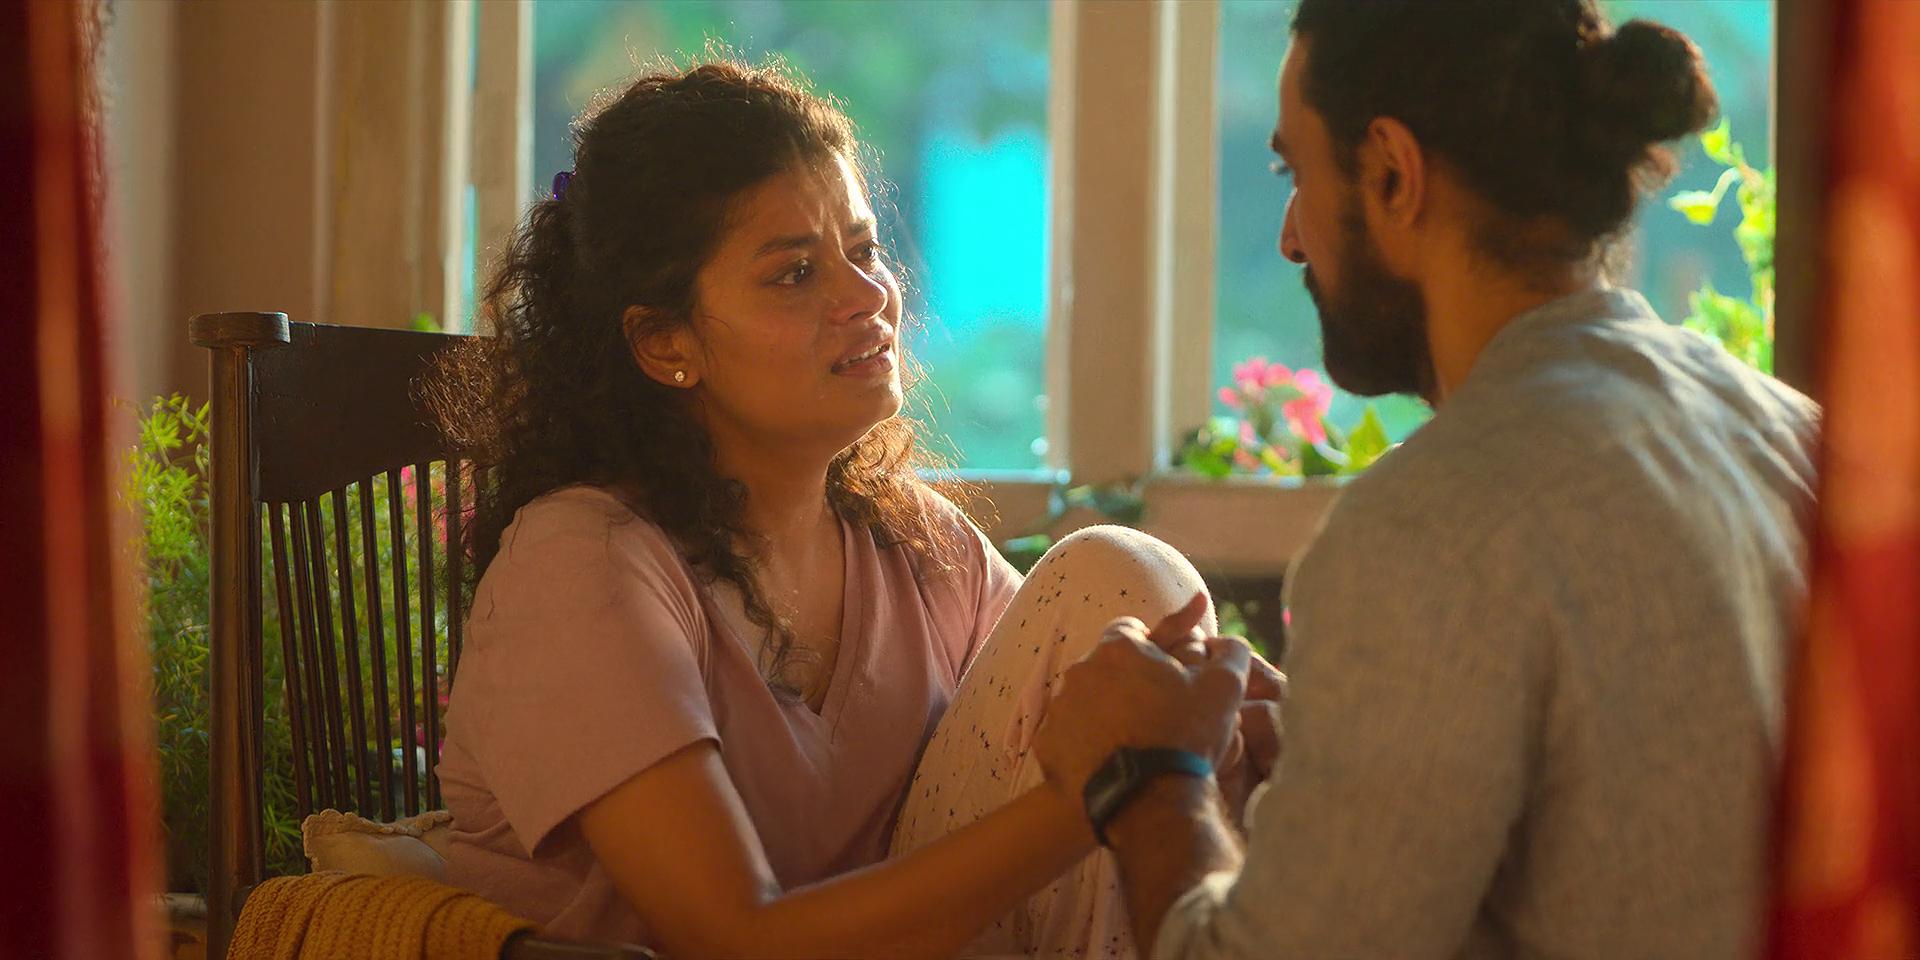 Ankahi Kahaniya 2021 Hindi Movie Download HDRip || 1080p || 720p || 480p